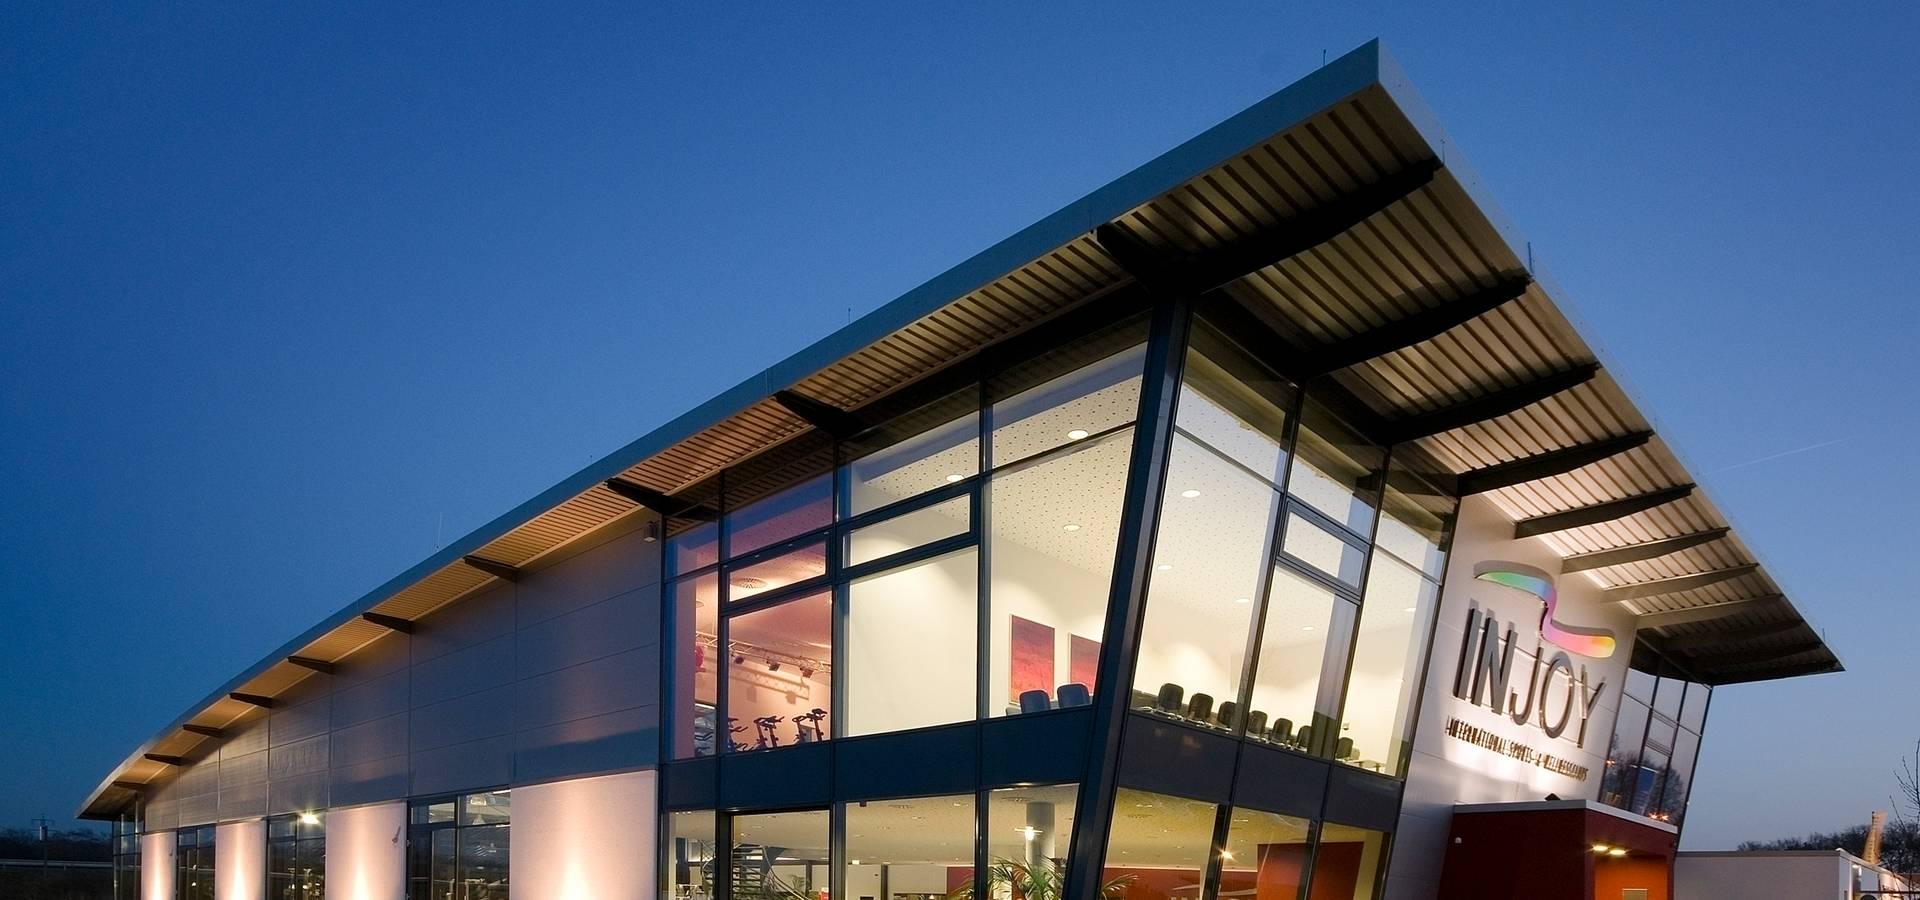 lindschulte ingenieure architekten architetti a nordhorn homify. Black Bedroom Furniture Sets. Home Design Ideas